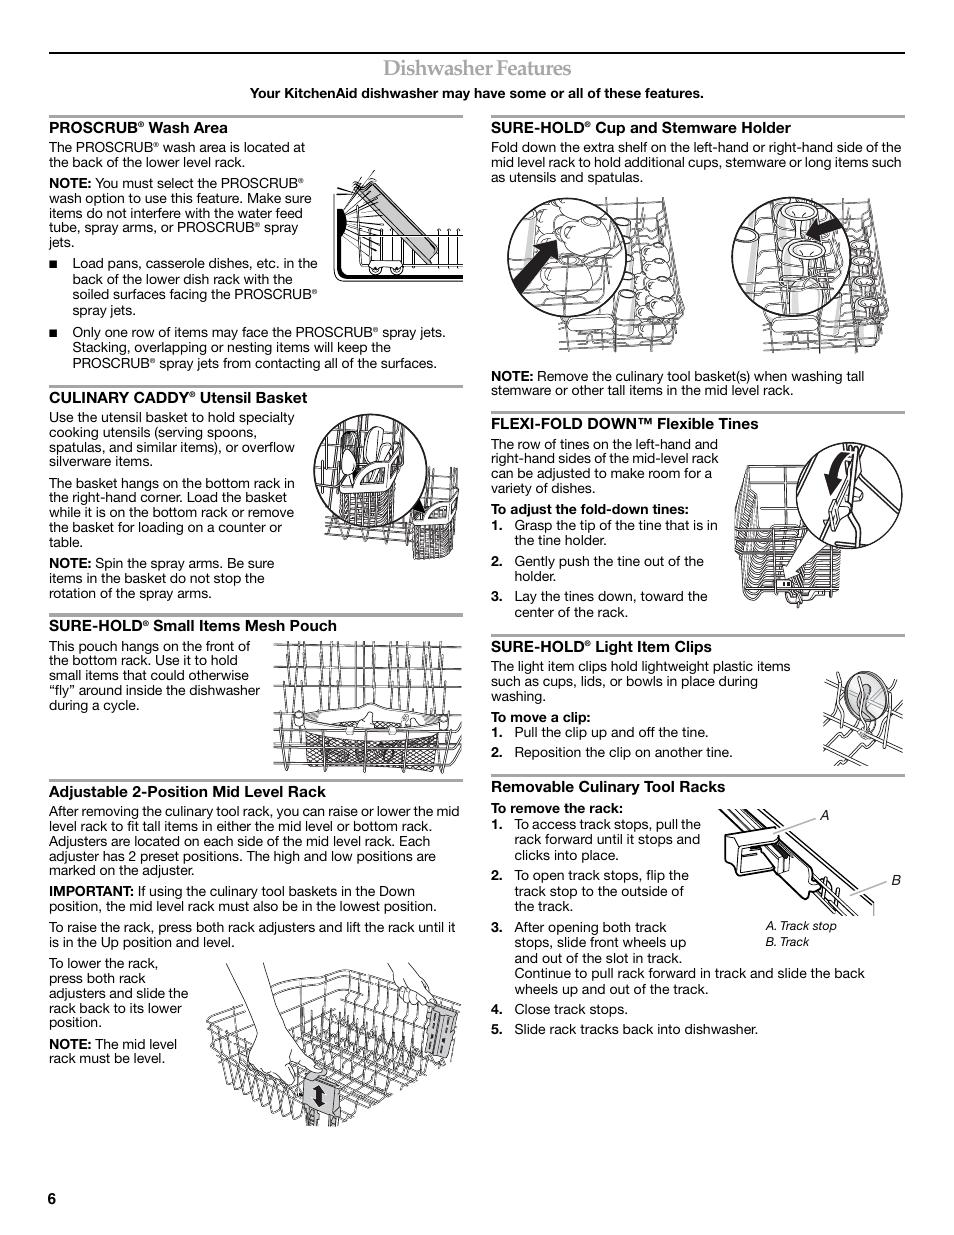 Dishwasher features | KITCHENAID W10205938A Manuel d